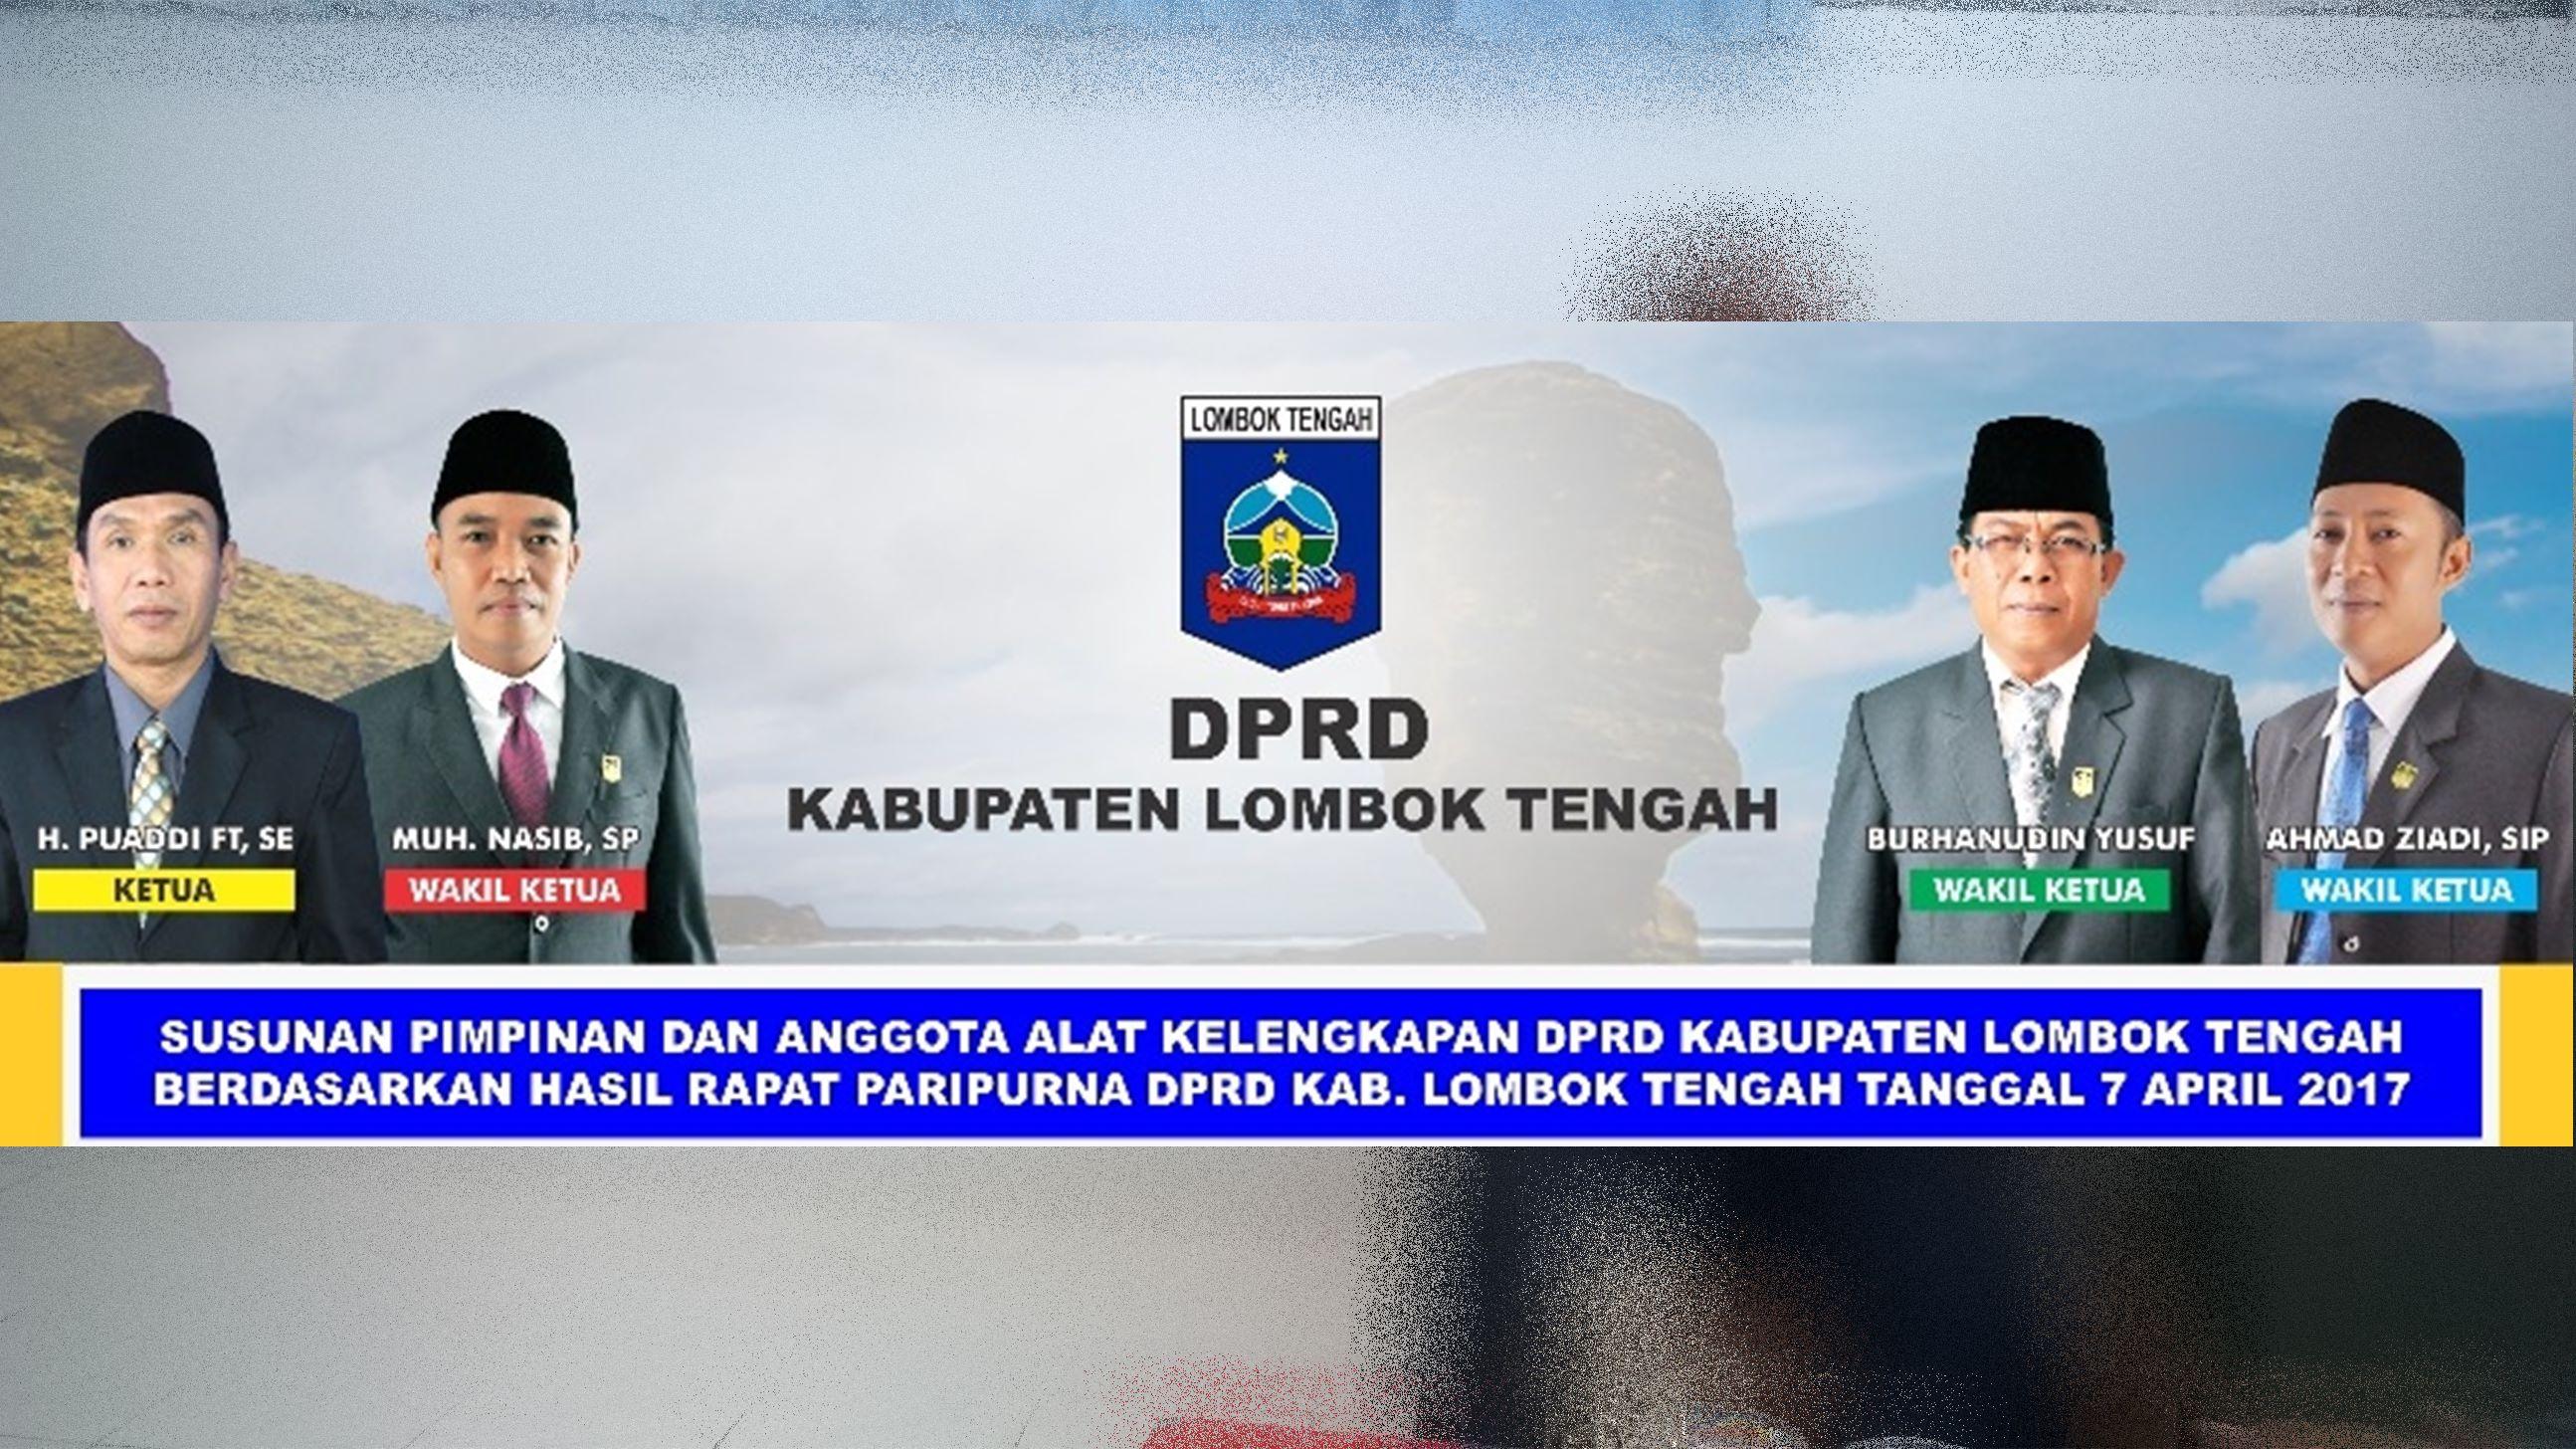 Susunan Pimpinan dan Anggota Alat Kelengkapan DPRD Lombok Tengah Berdasarkan Hasil Rapar Paripurna DPRD Lombok Tengah Tanggal, 7 April 2017